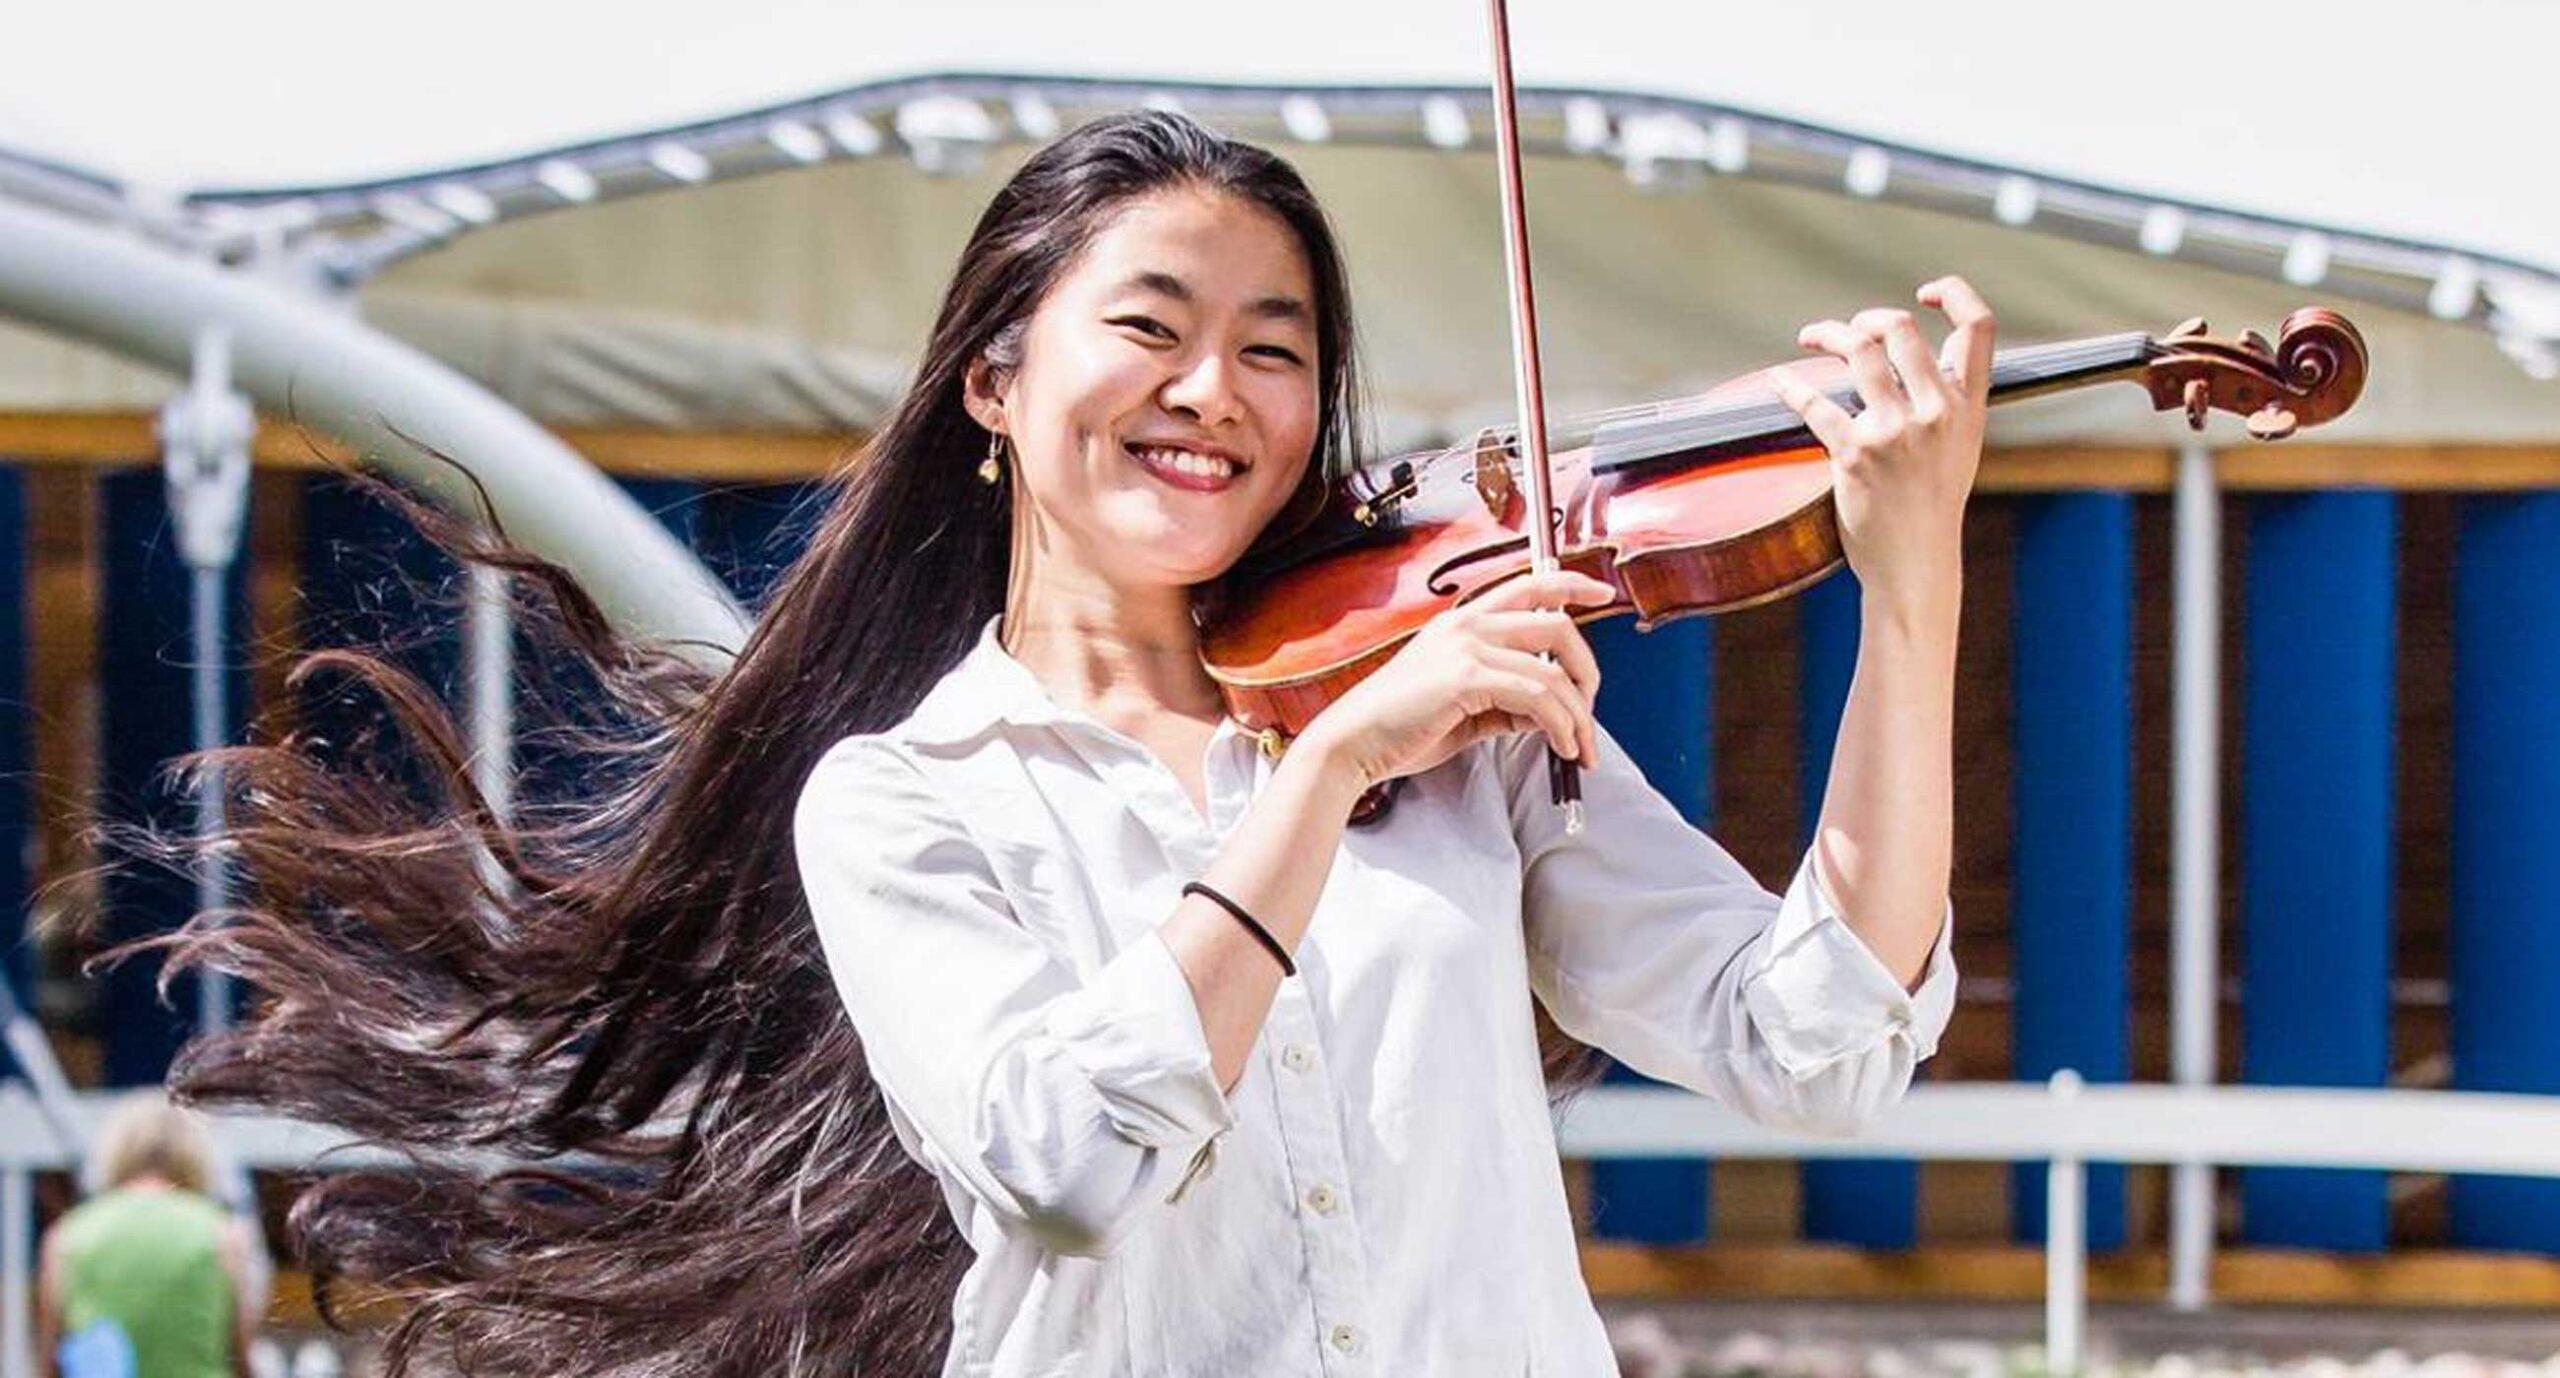 Kako Miura playing violin outside, smiling